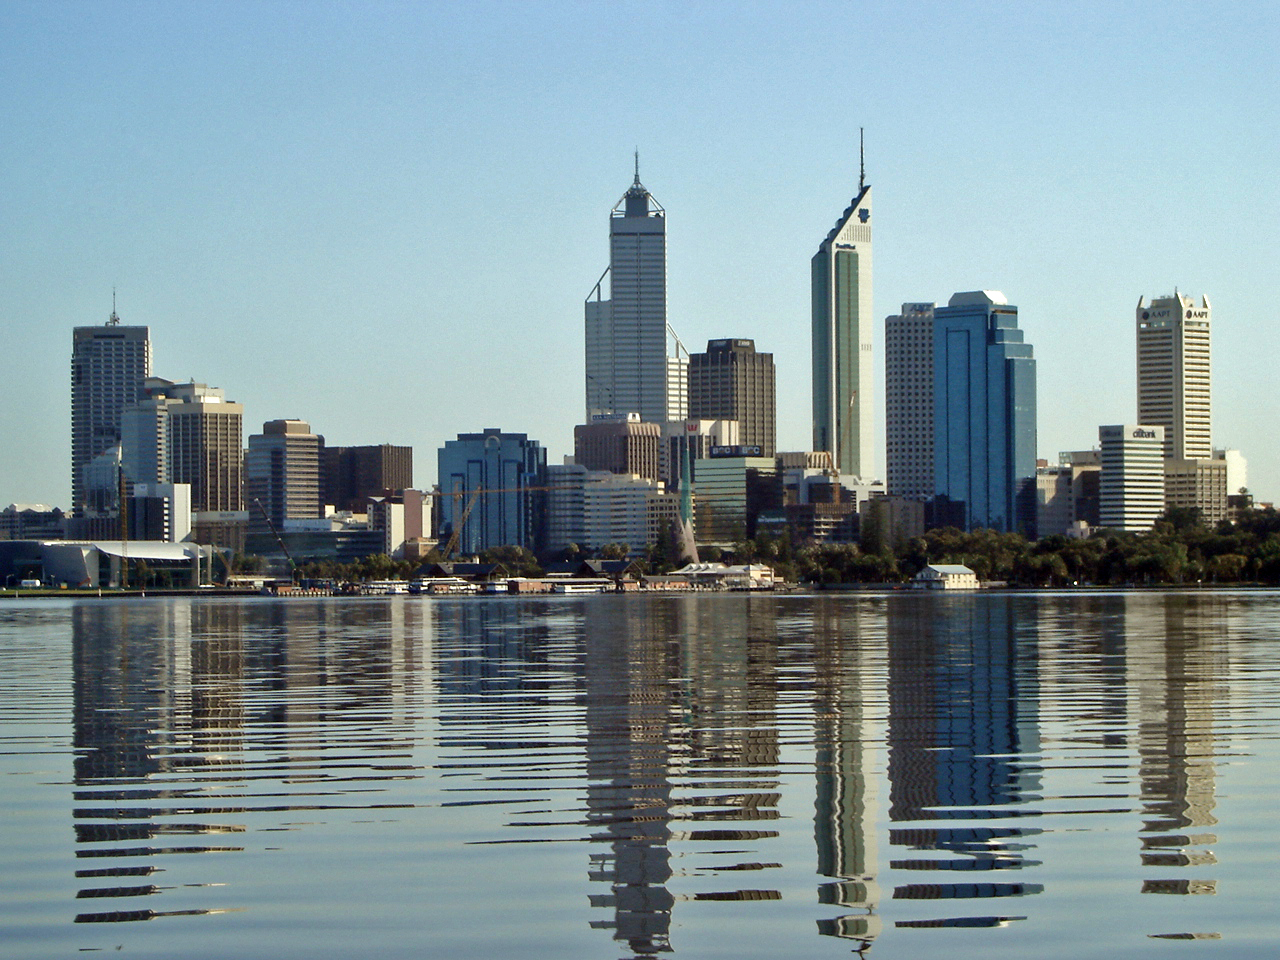 The skyline of Perth, Western Australia. (Courtesy of Wikimedia)